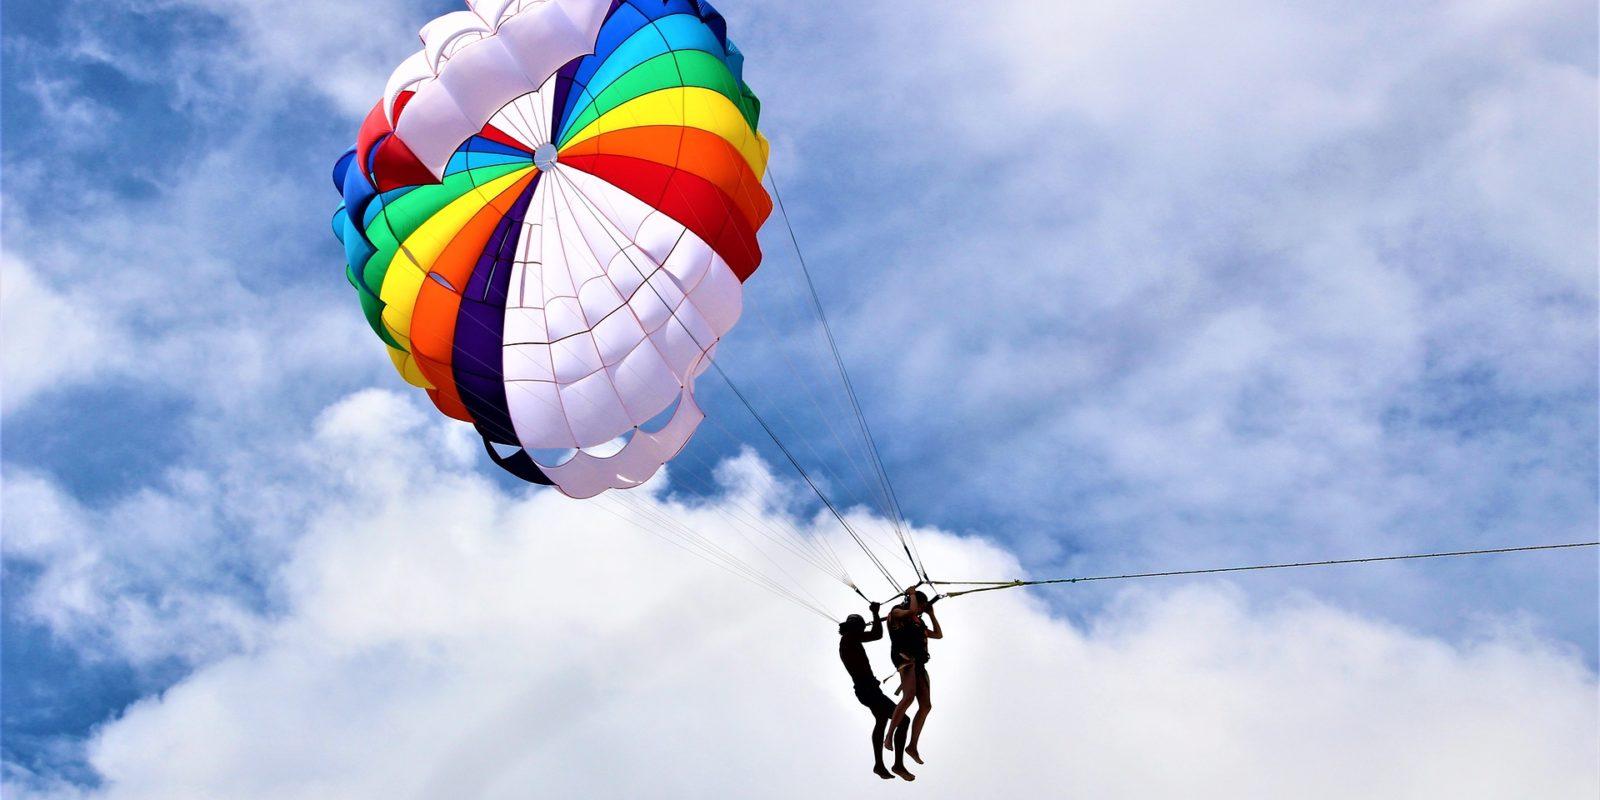 Couple parasailing, Phuket, Thailand.